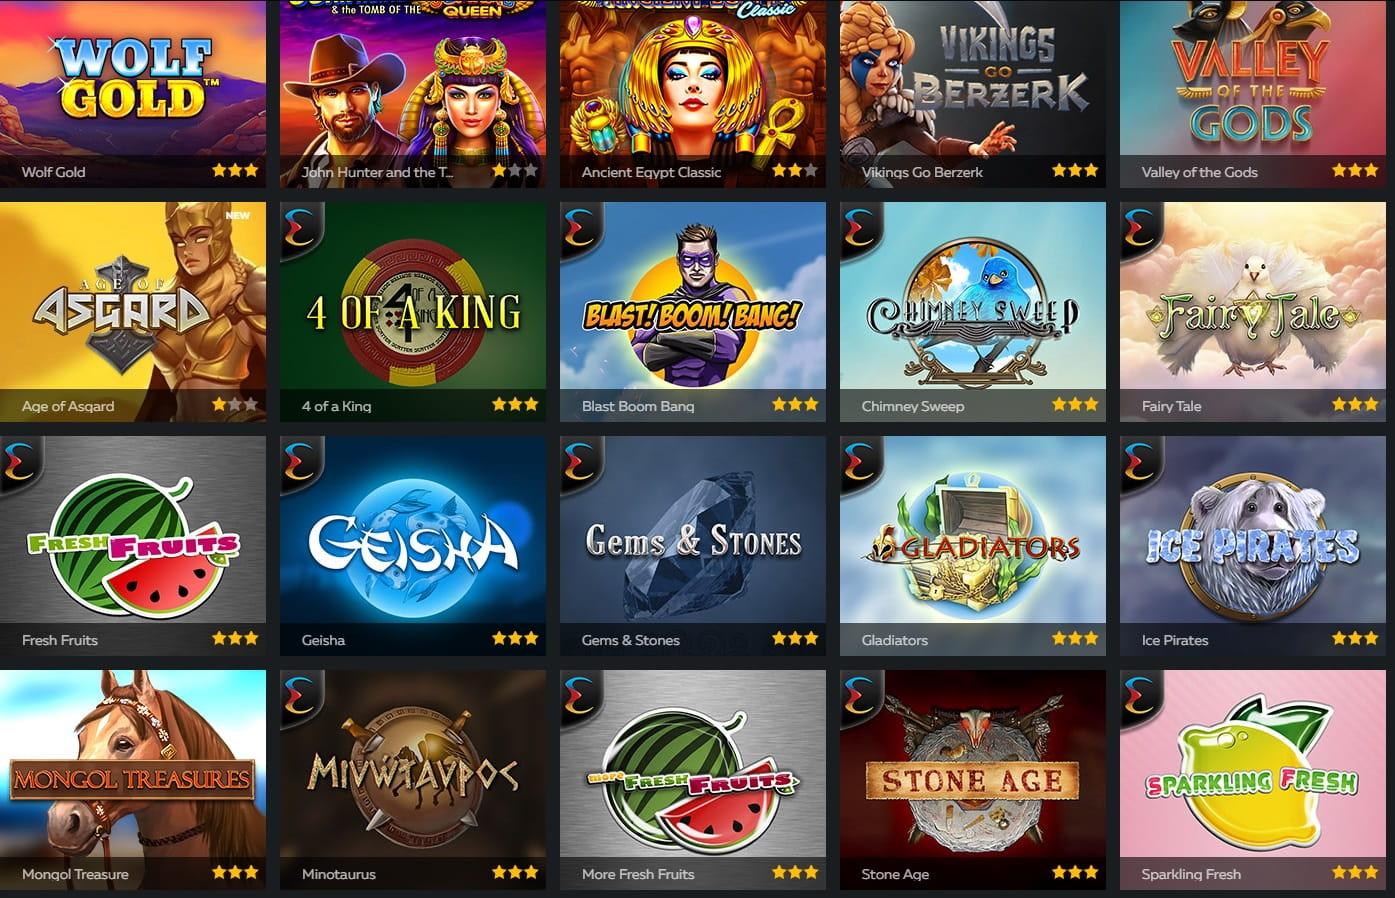 Online casinos that accept prepaid mastercard